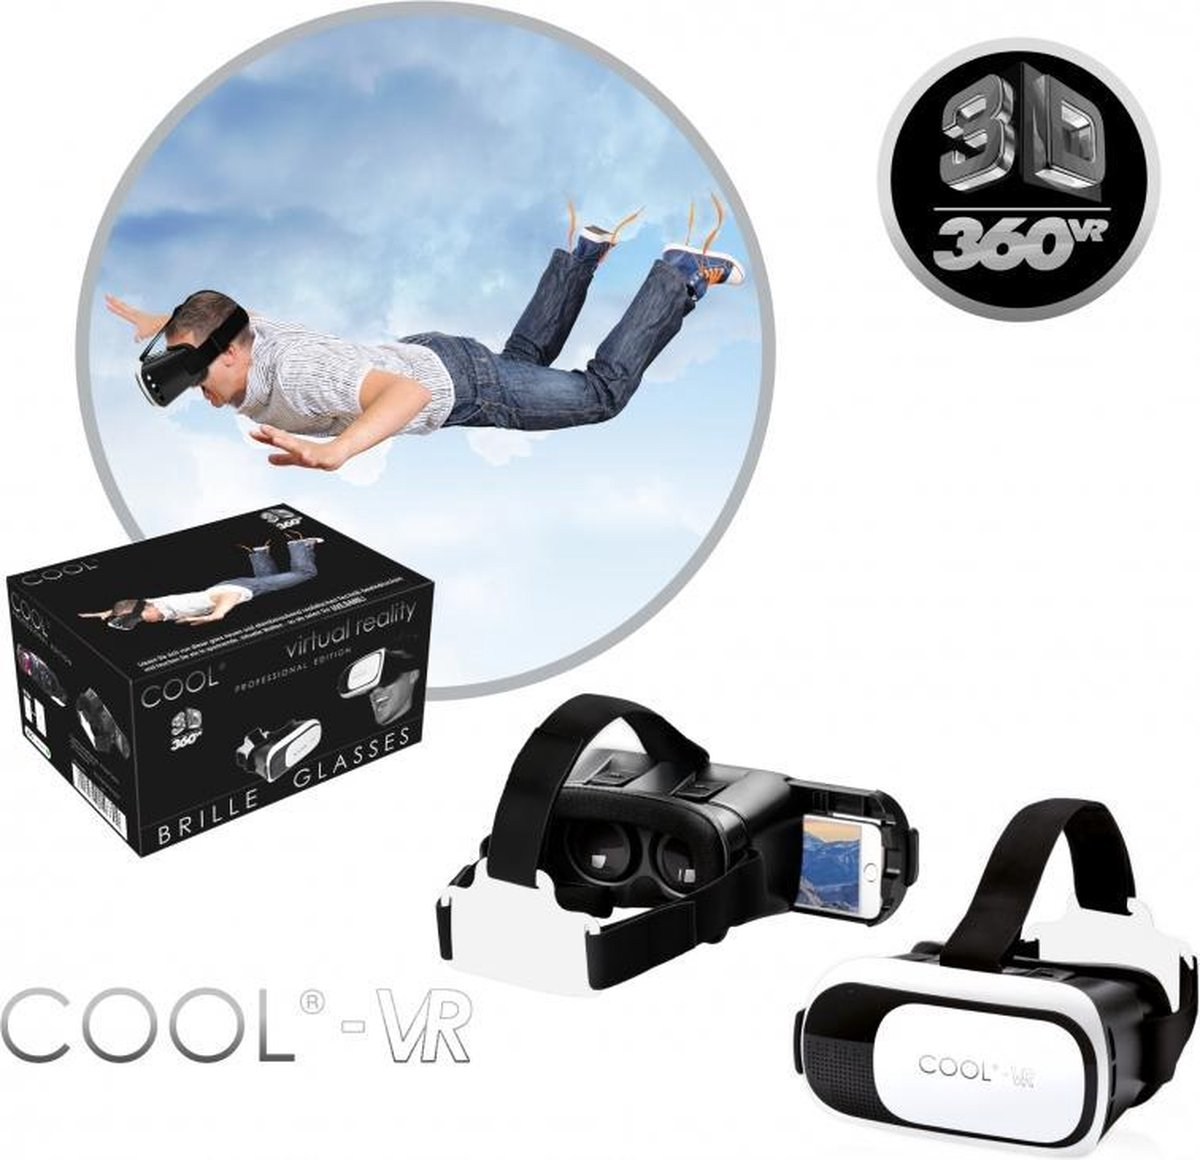 Cool Virtual Reality 3D Bril